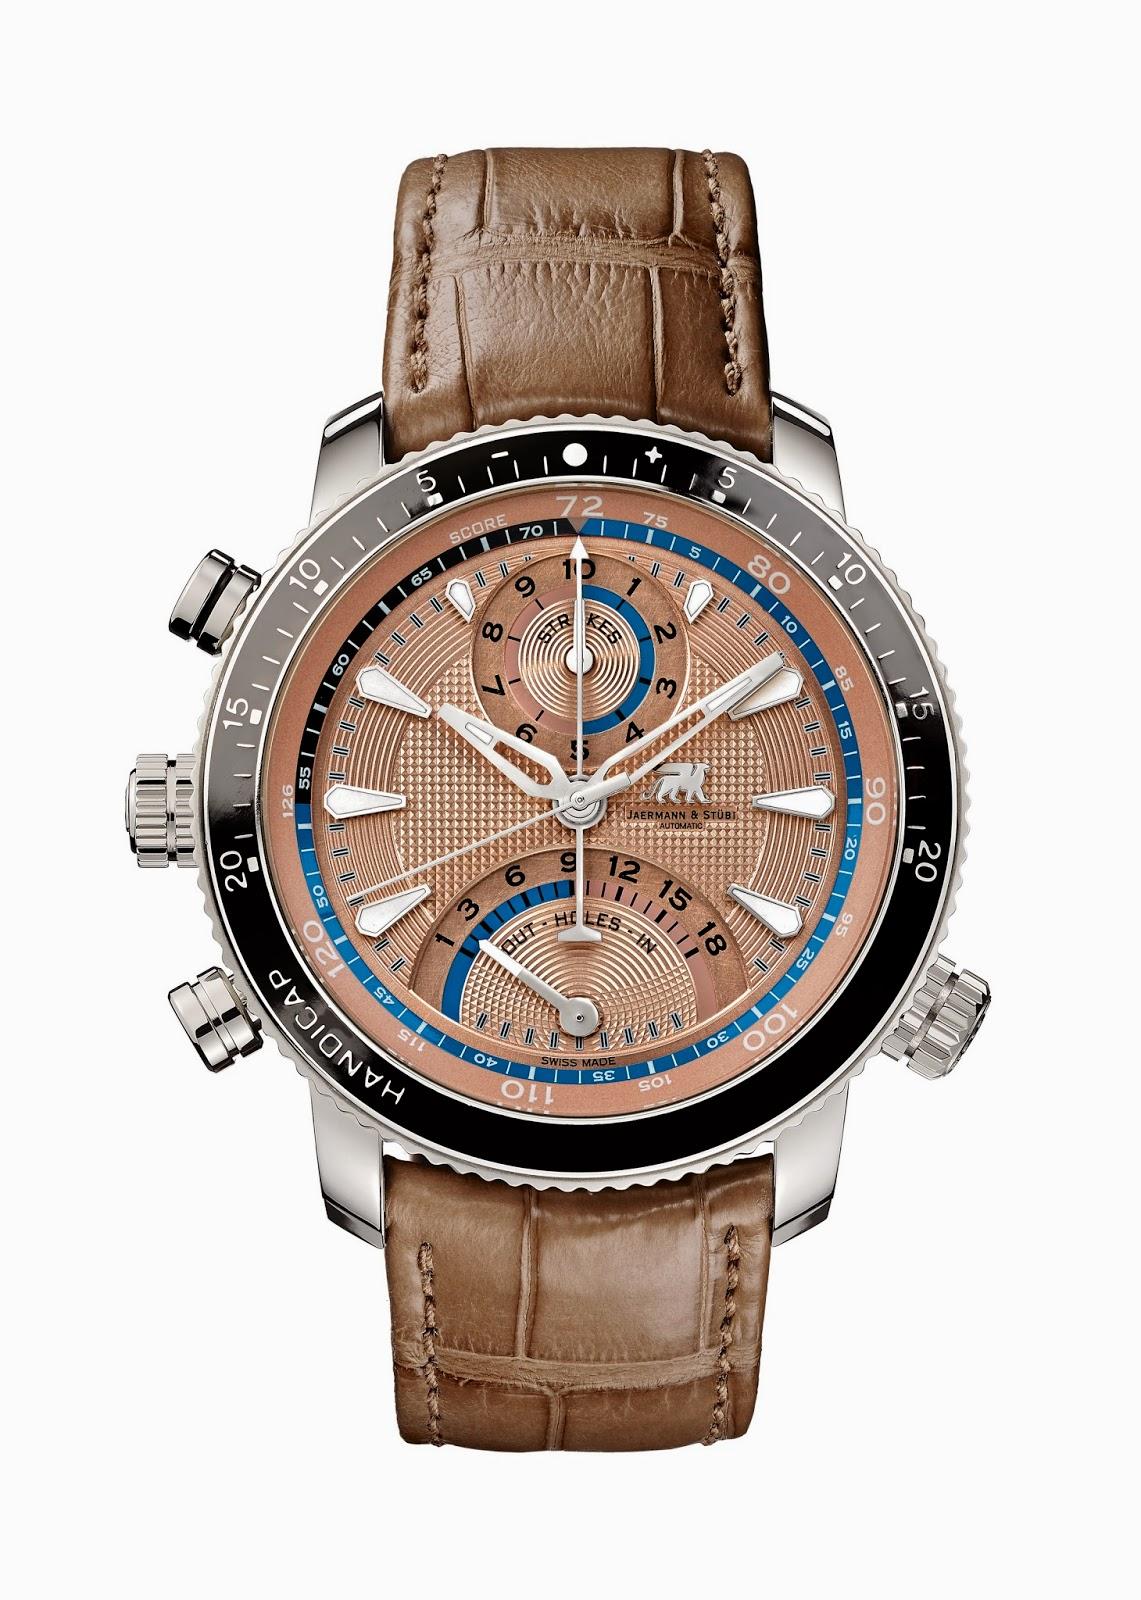 Jaermann & Stübi the The Timepiece Of Golf 4